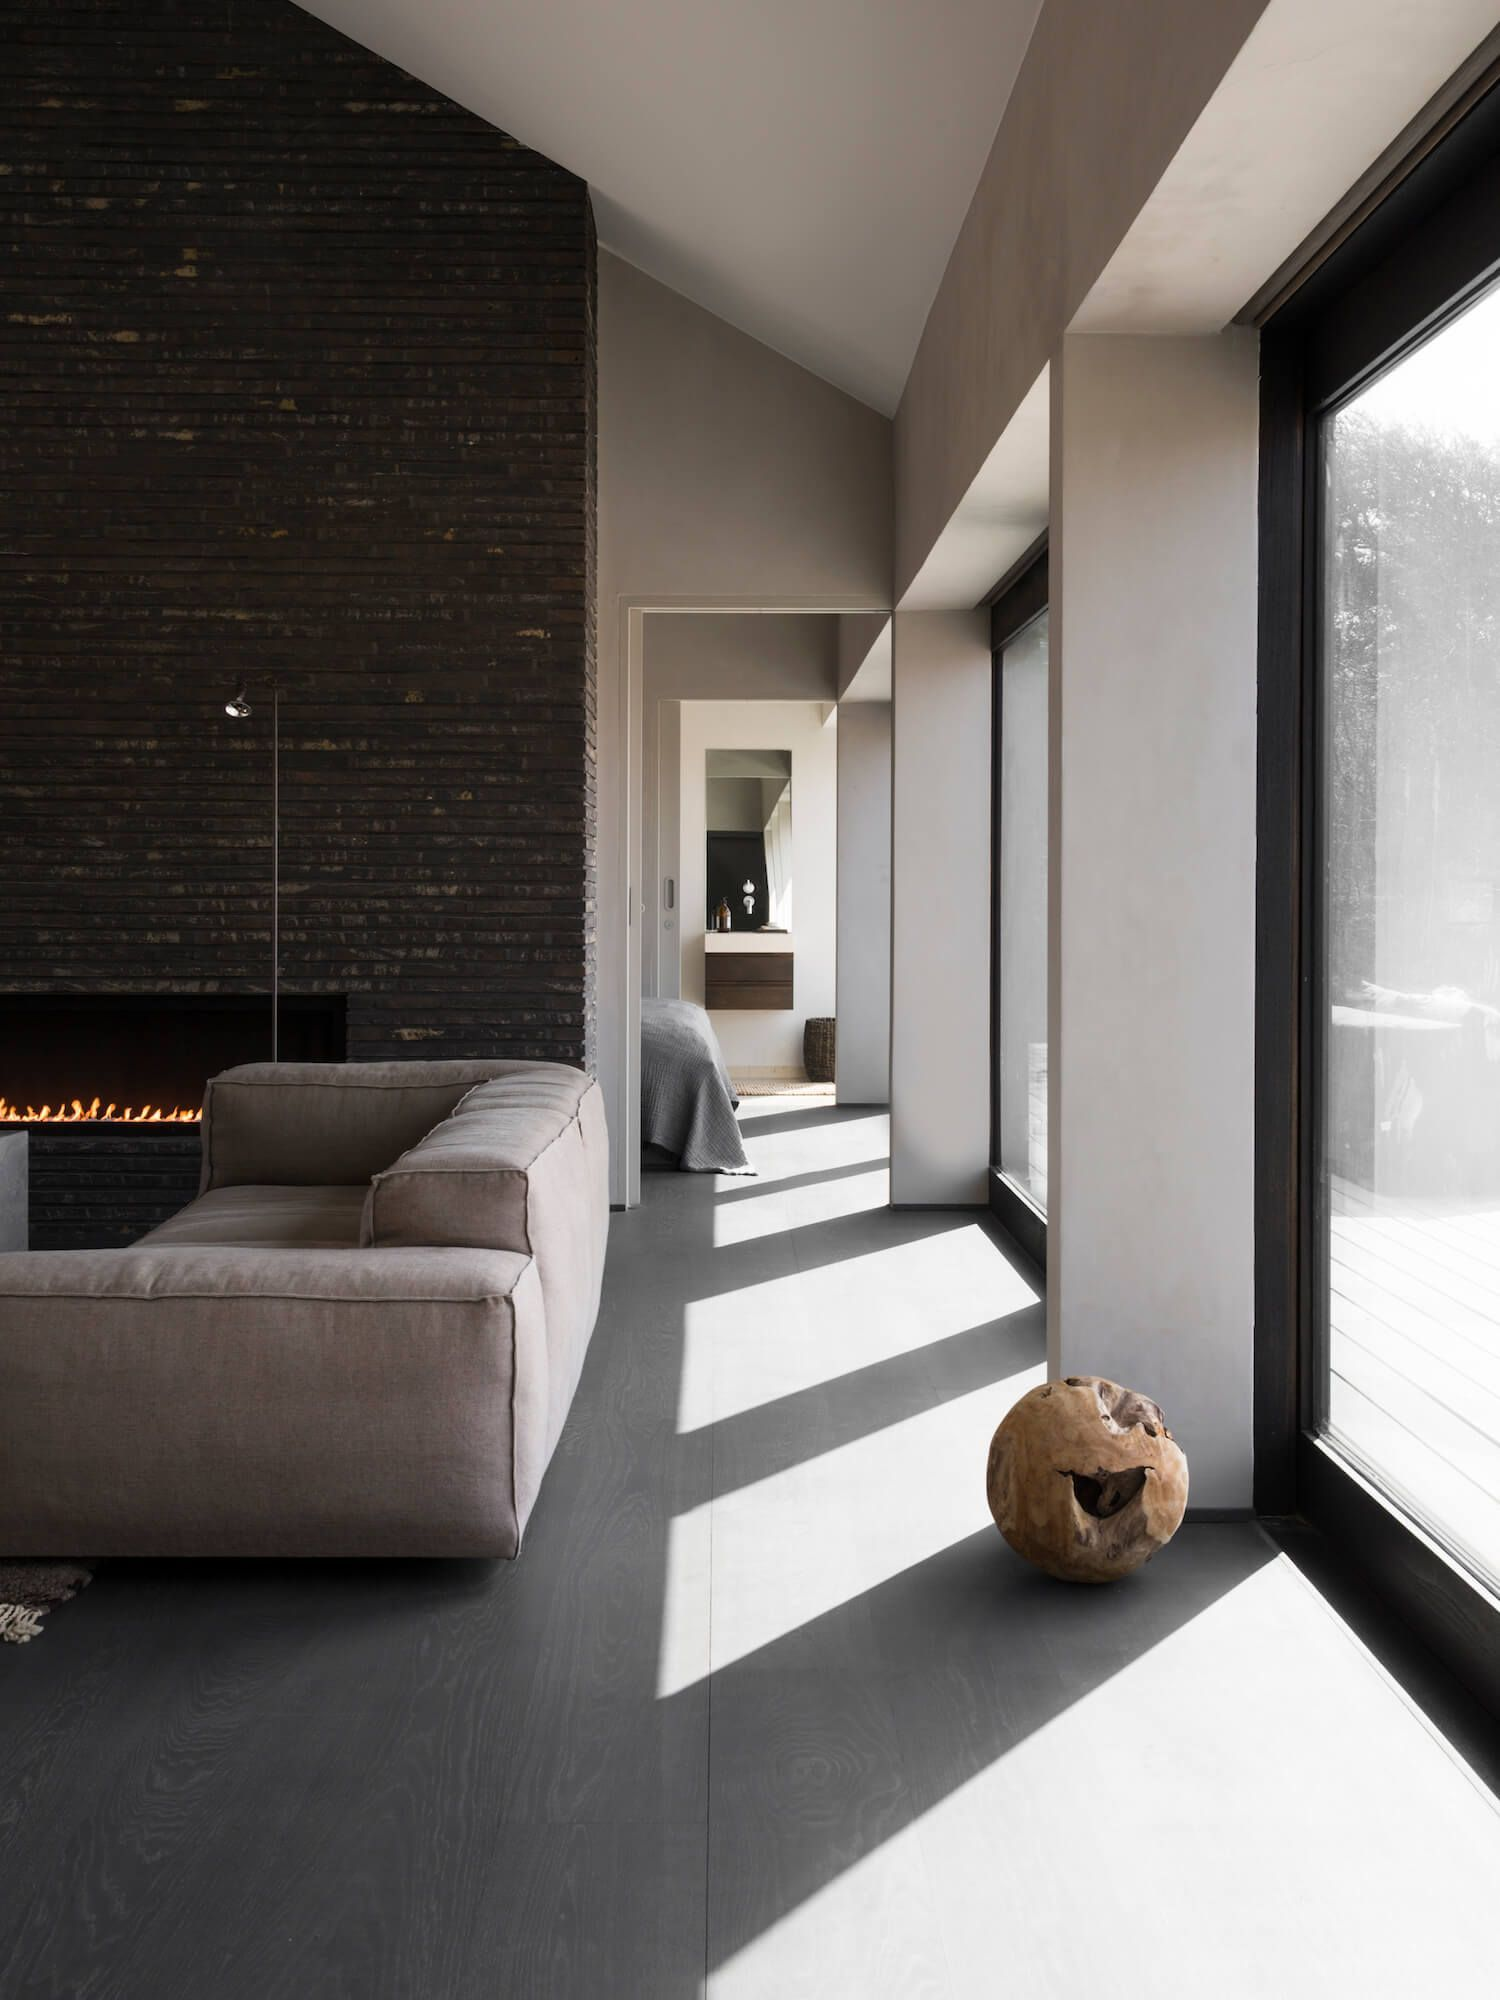 Seaside Abode By Norm Architects #Minimalistdecorparty